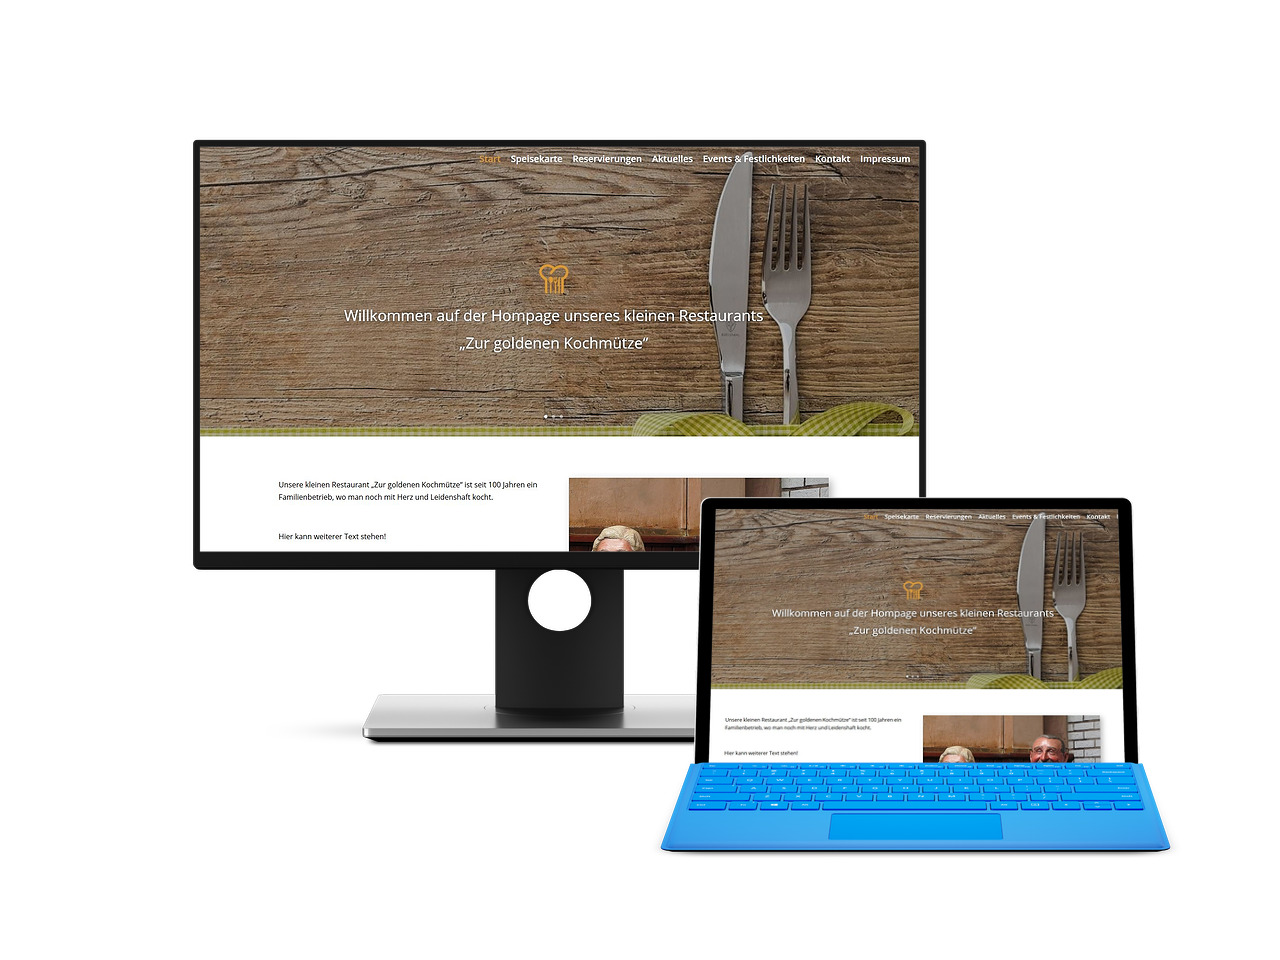 Restaurant Webdesign Hechthausen Hemmoor Wingst Cuxhaven Stade